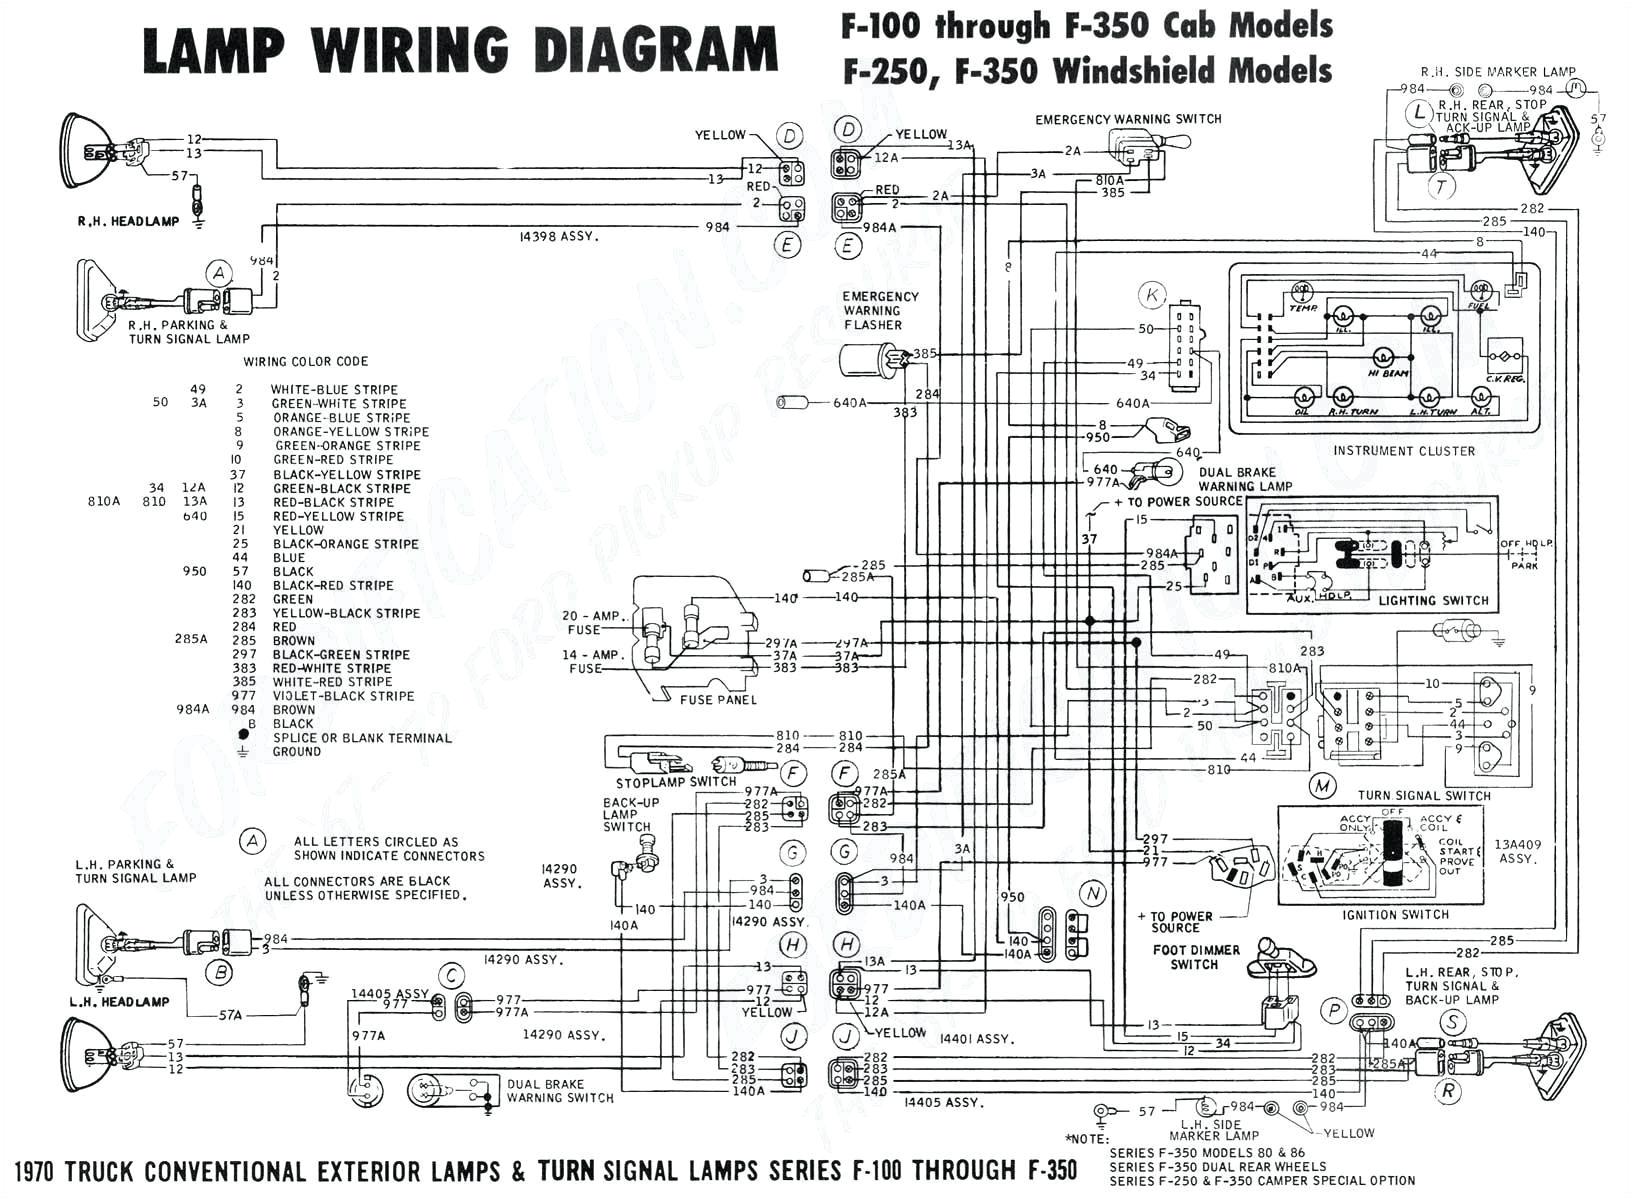 1989 honda civic engine diagram wiring diagram datasource1986 honda civic wiring diagram schema wiring diagram 1986